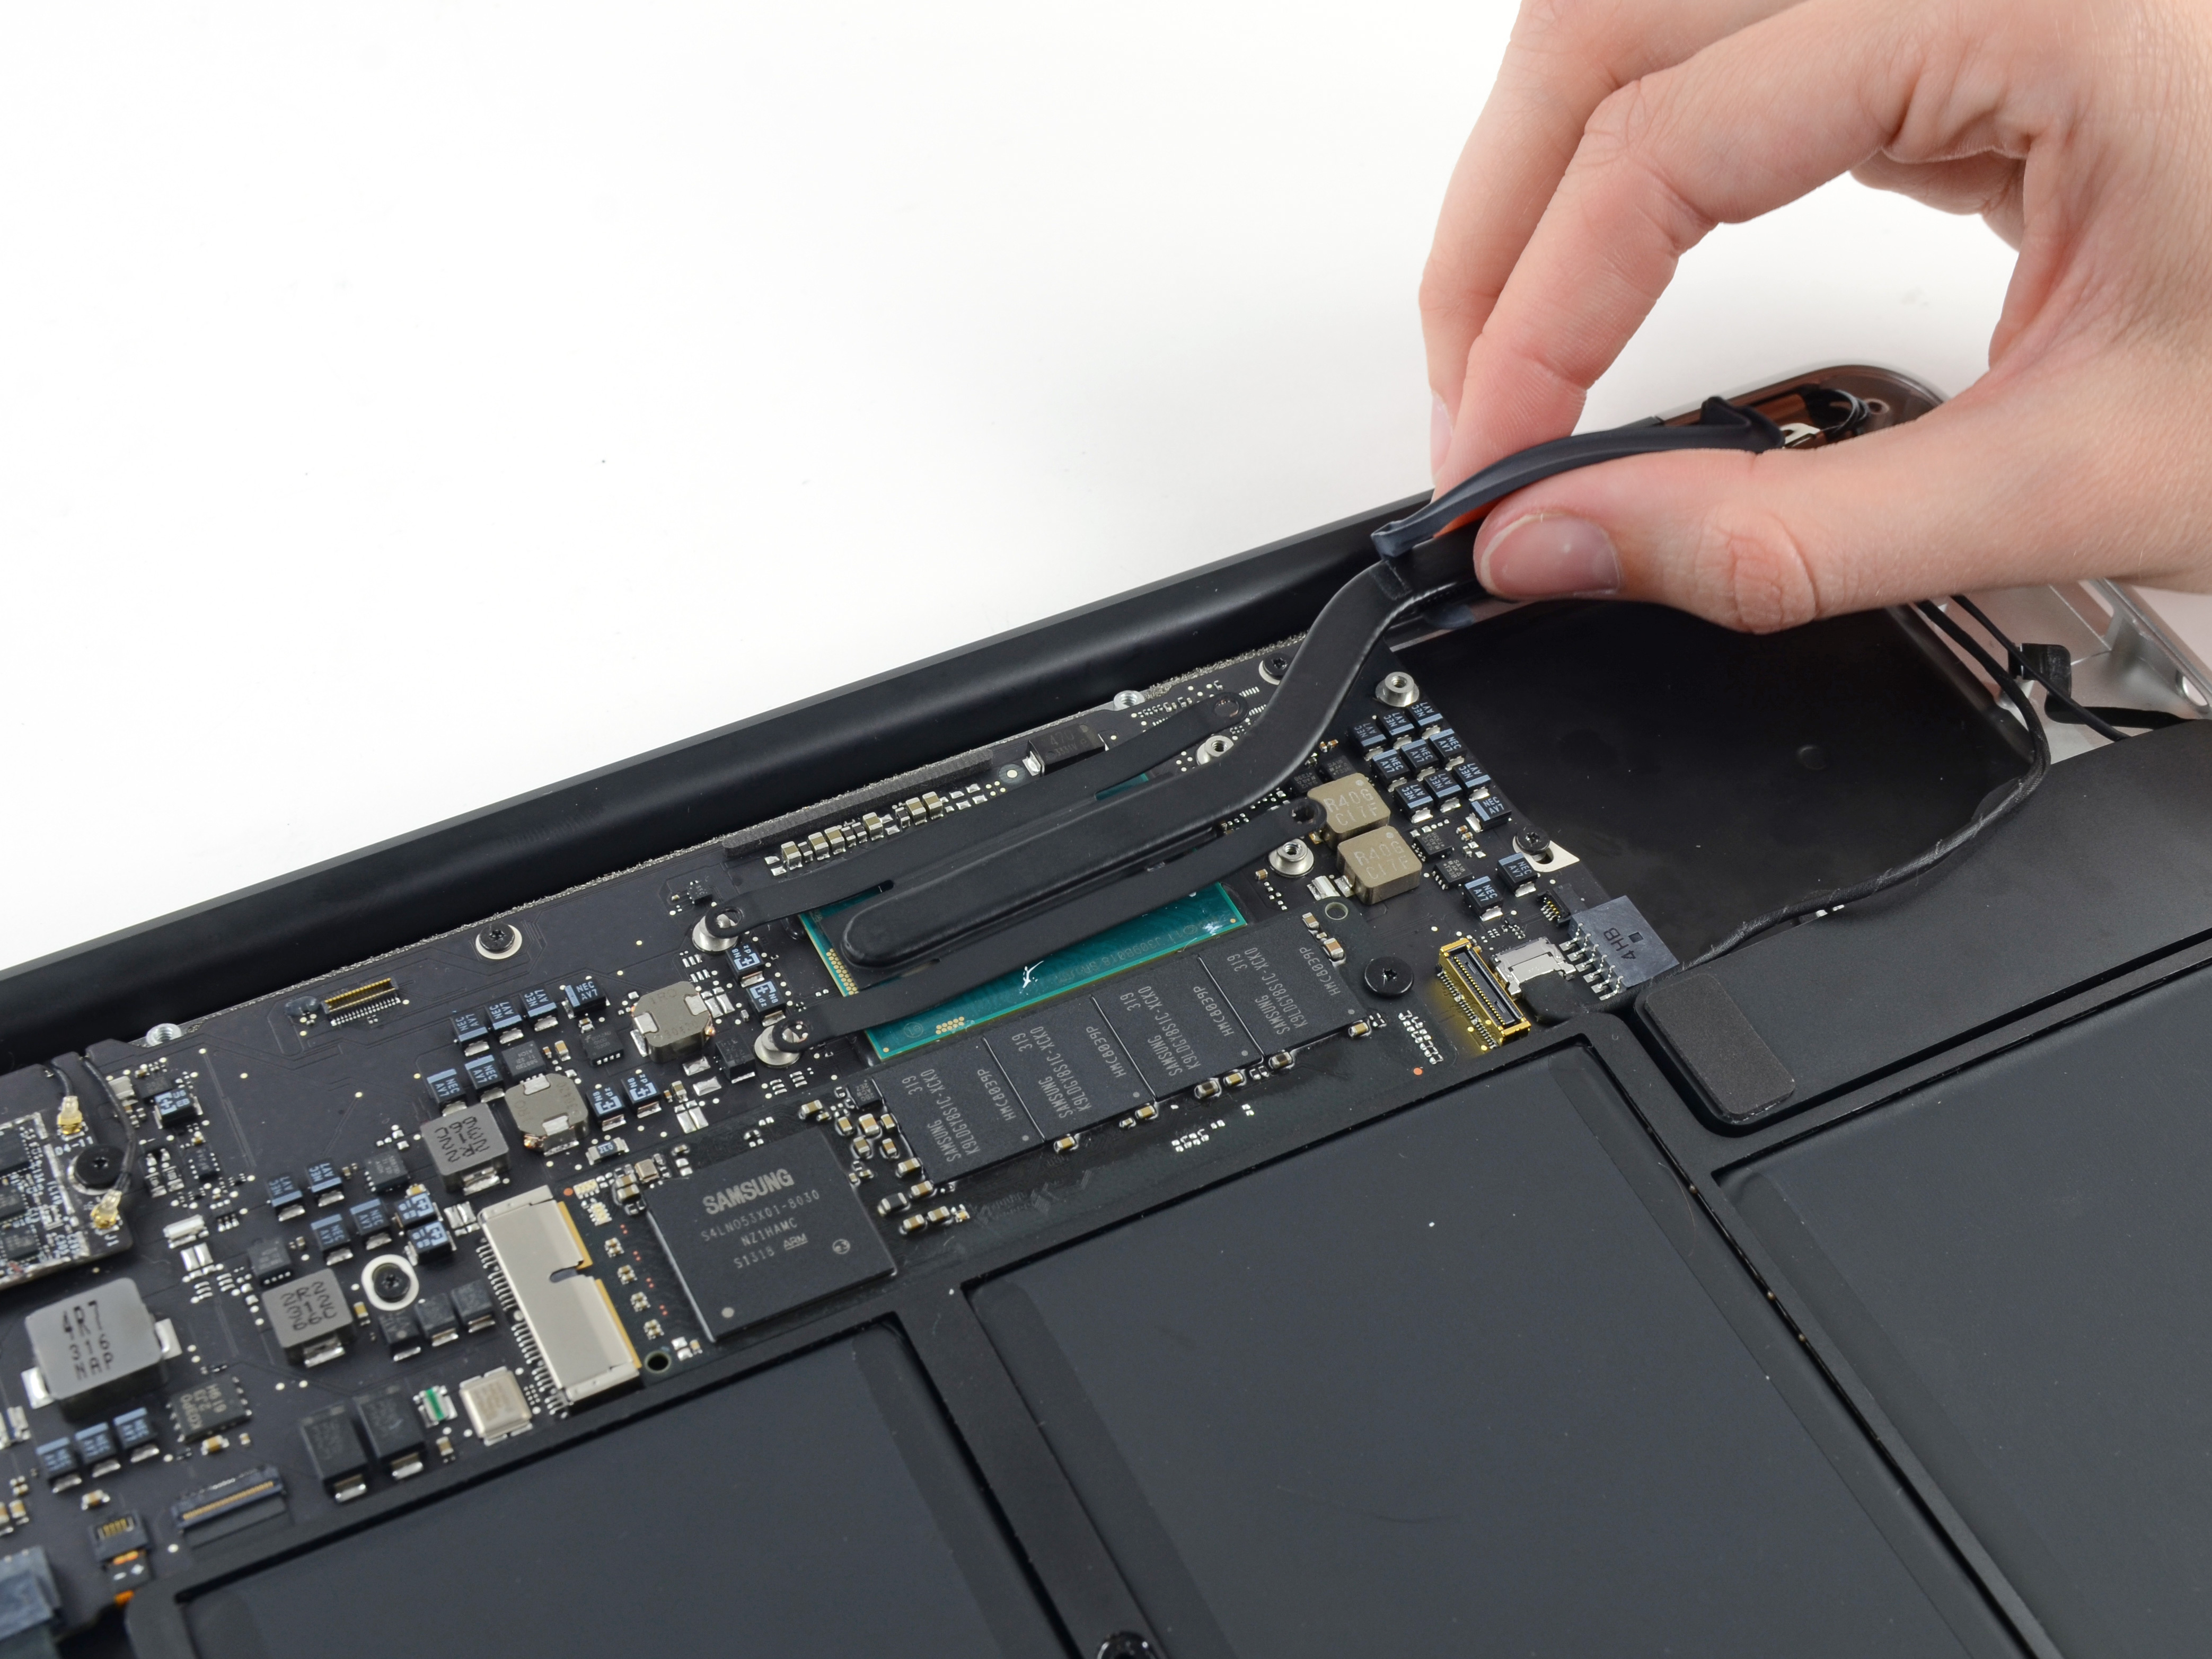 macbook air 13 early 2014 repair ifixit rh ifixit com macbook air 2011 repair manual macbook air 2011 repair manual